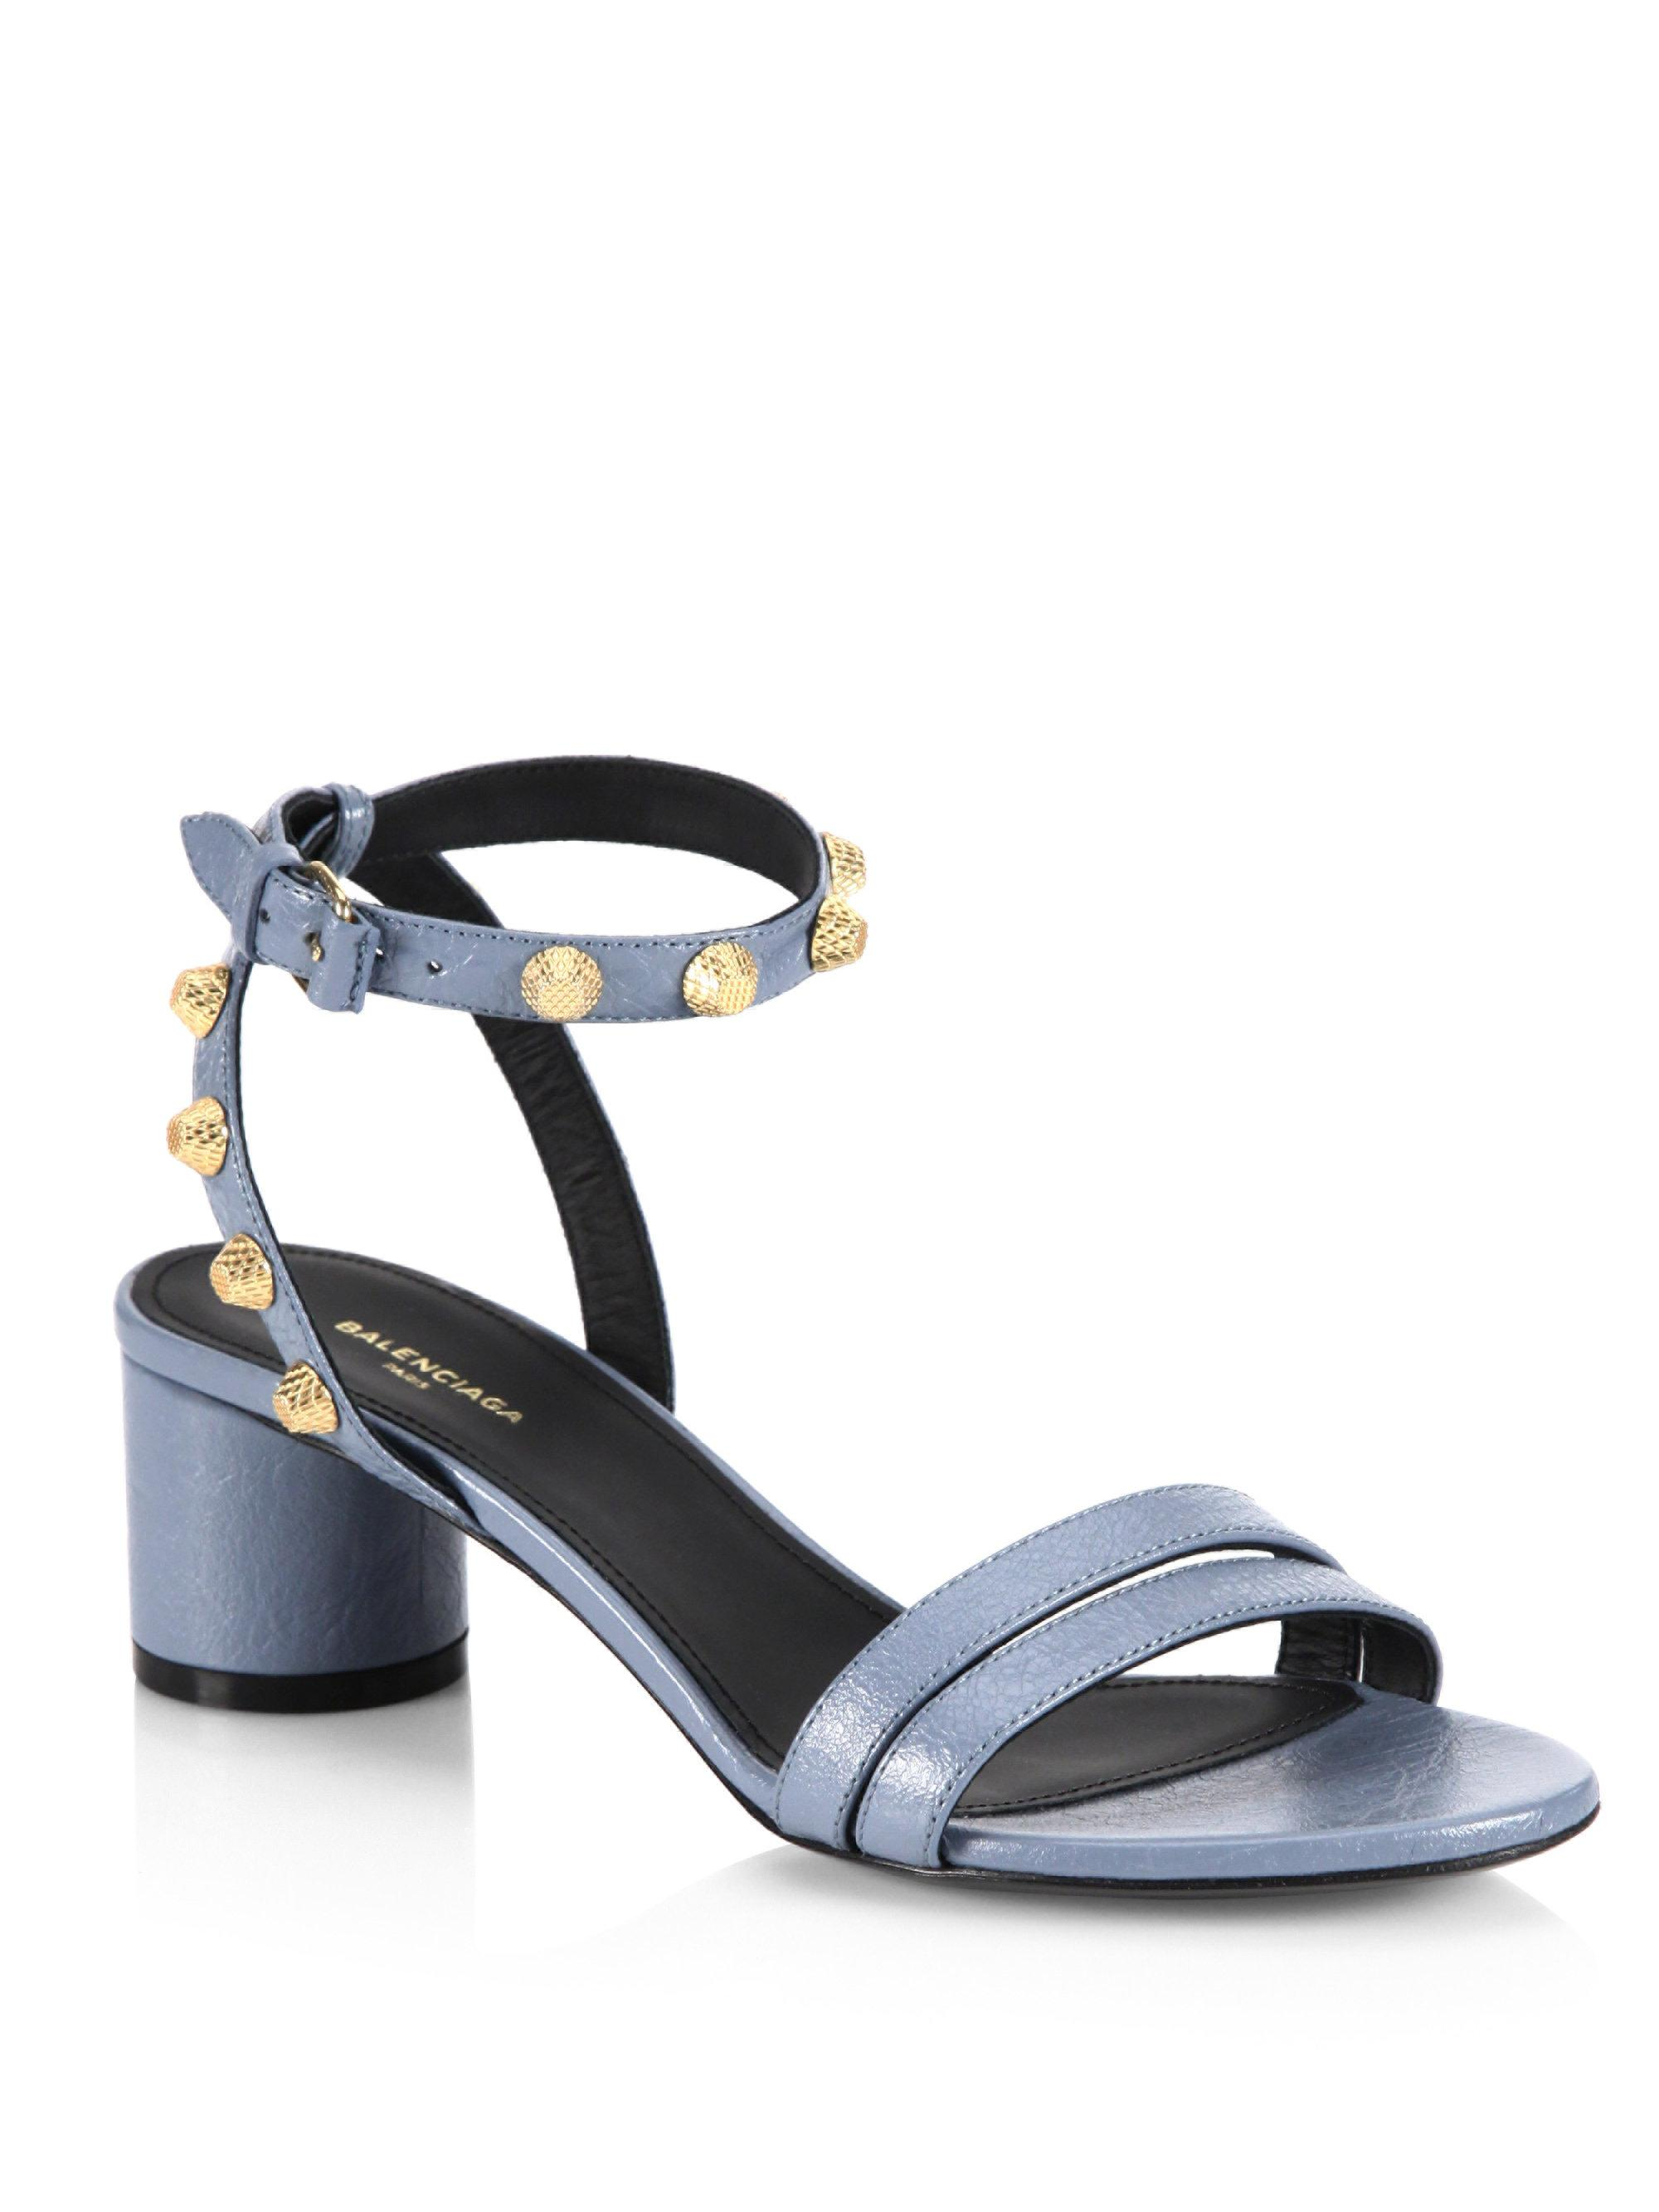 401b88c2575 Lyst - Balenciaga Leather Block Heel Studded Sandals in Blue